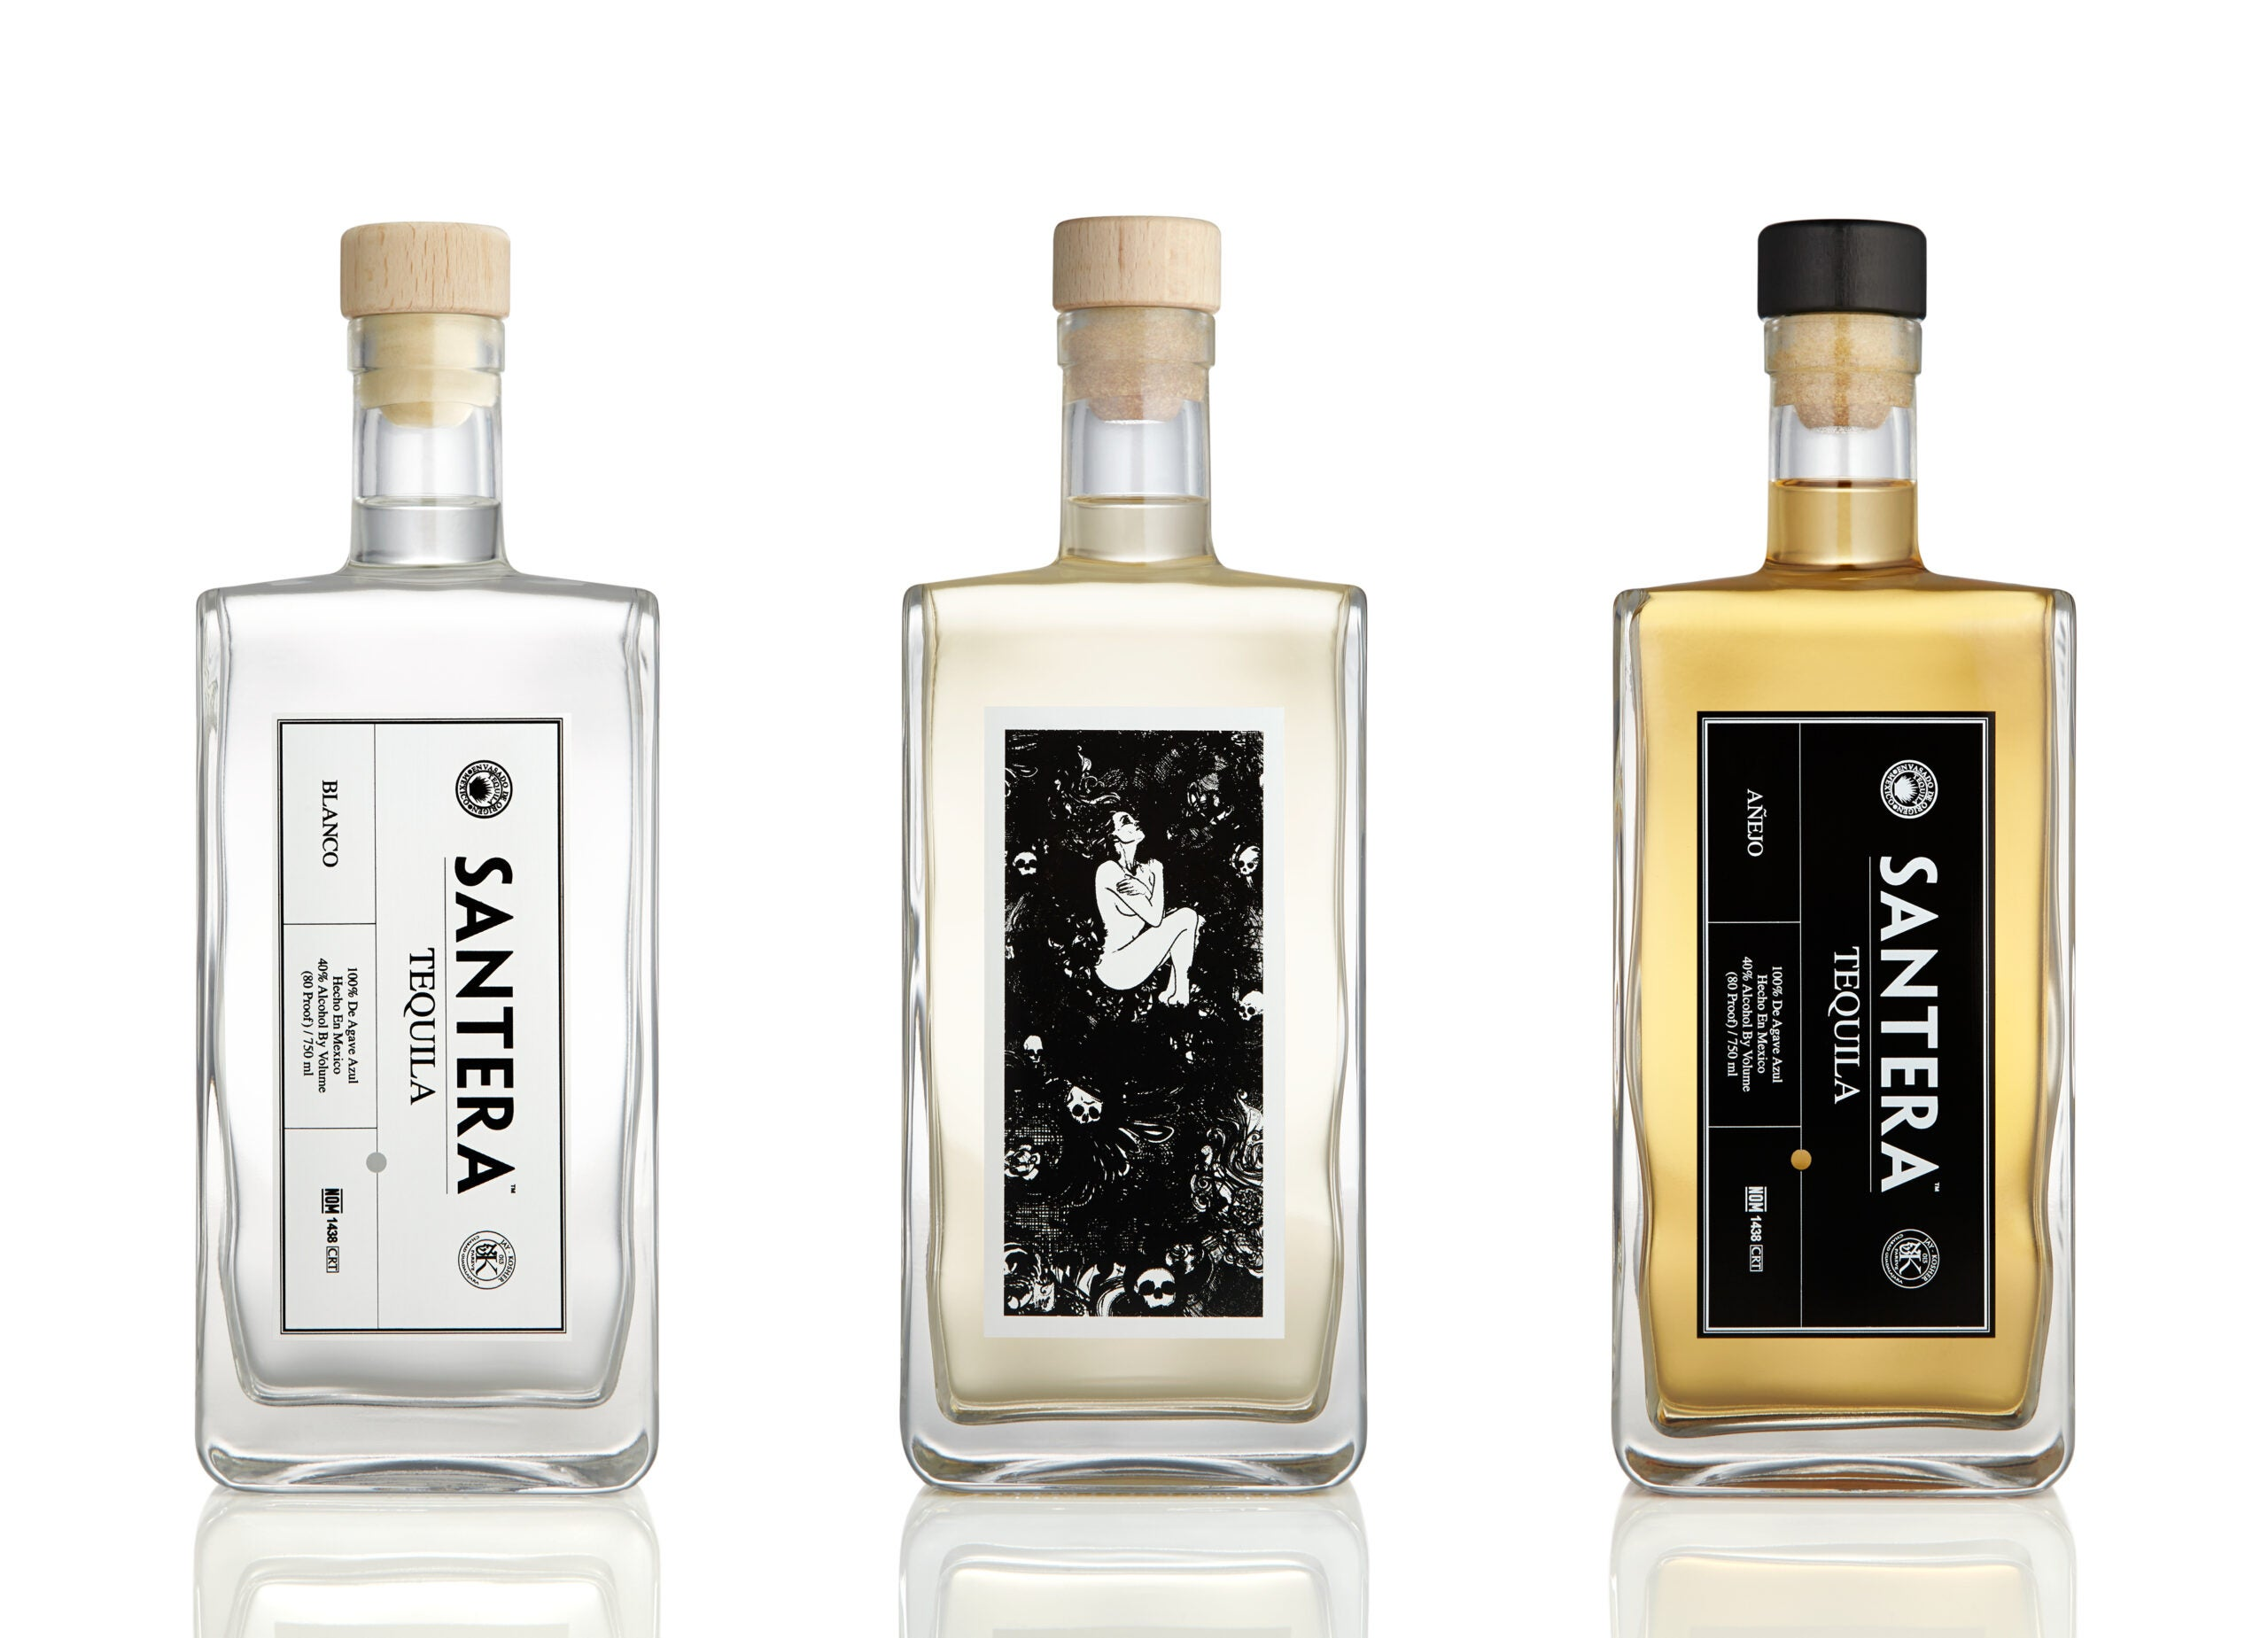 set of 3 tequila bottles